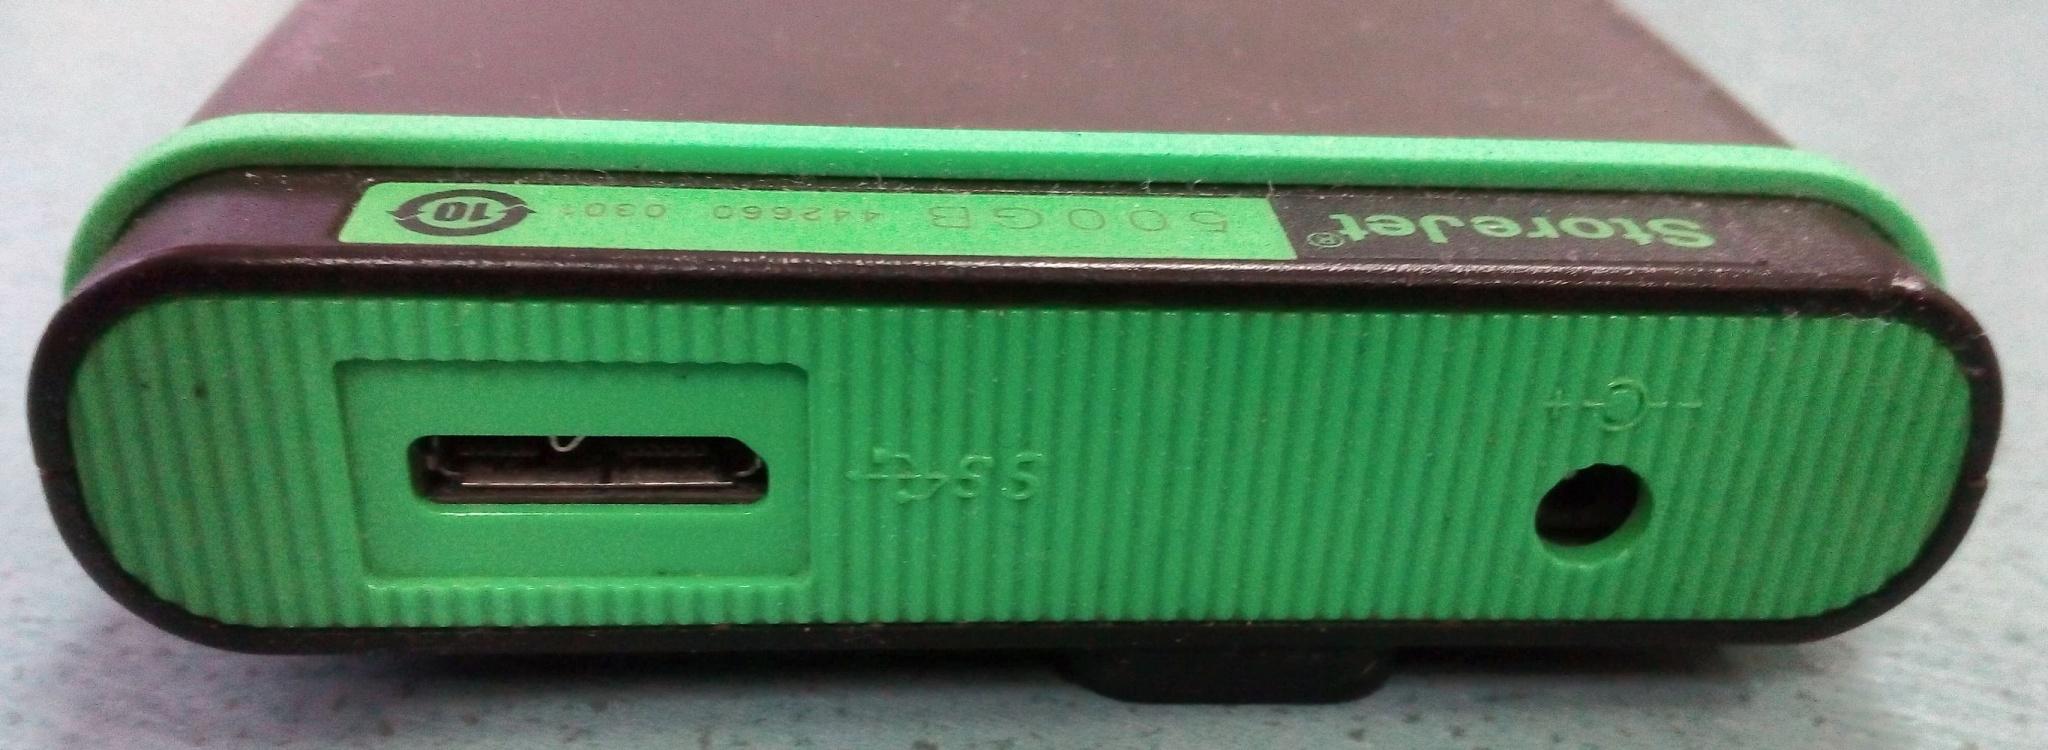 "Обзор на Внешний жесткий диск Transcend StoreJet 25M3 2.5"" 2.0Tb USB 3.0 TS2TSJ25M3 - изображение 3"